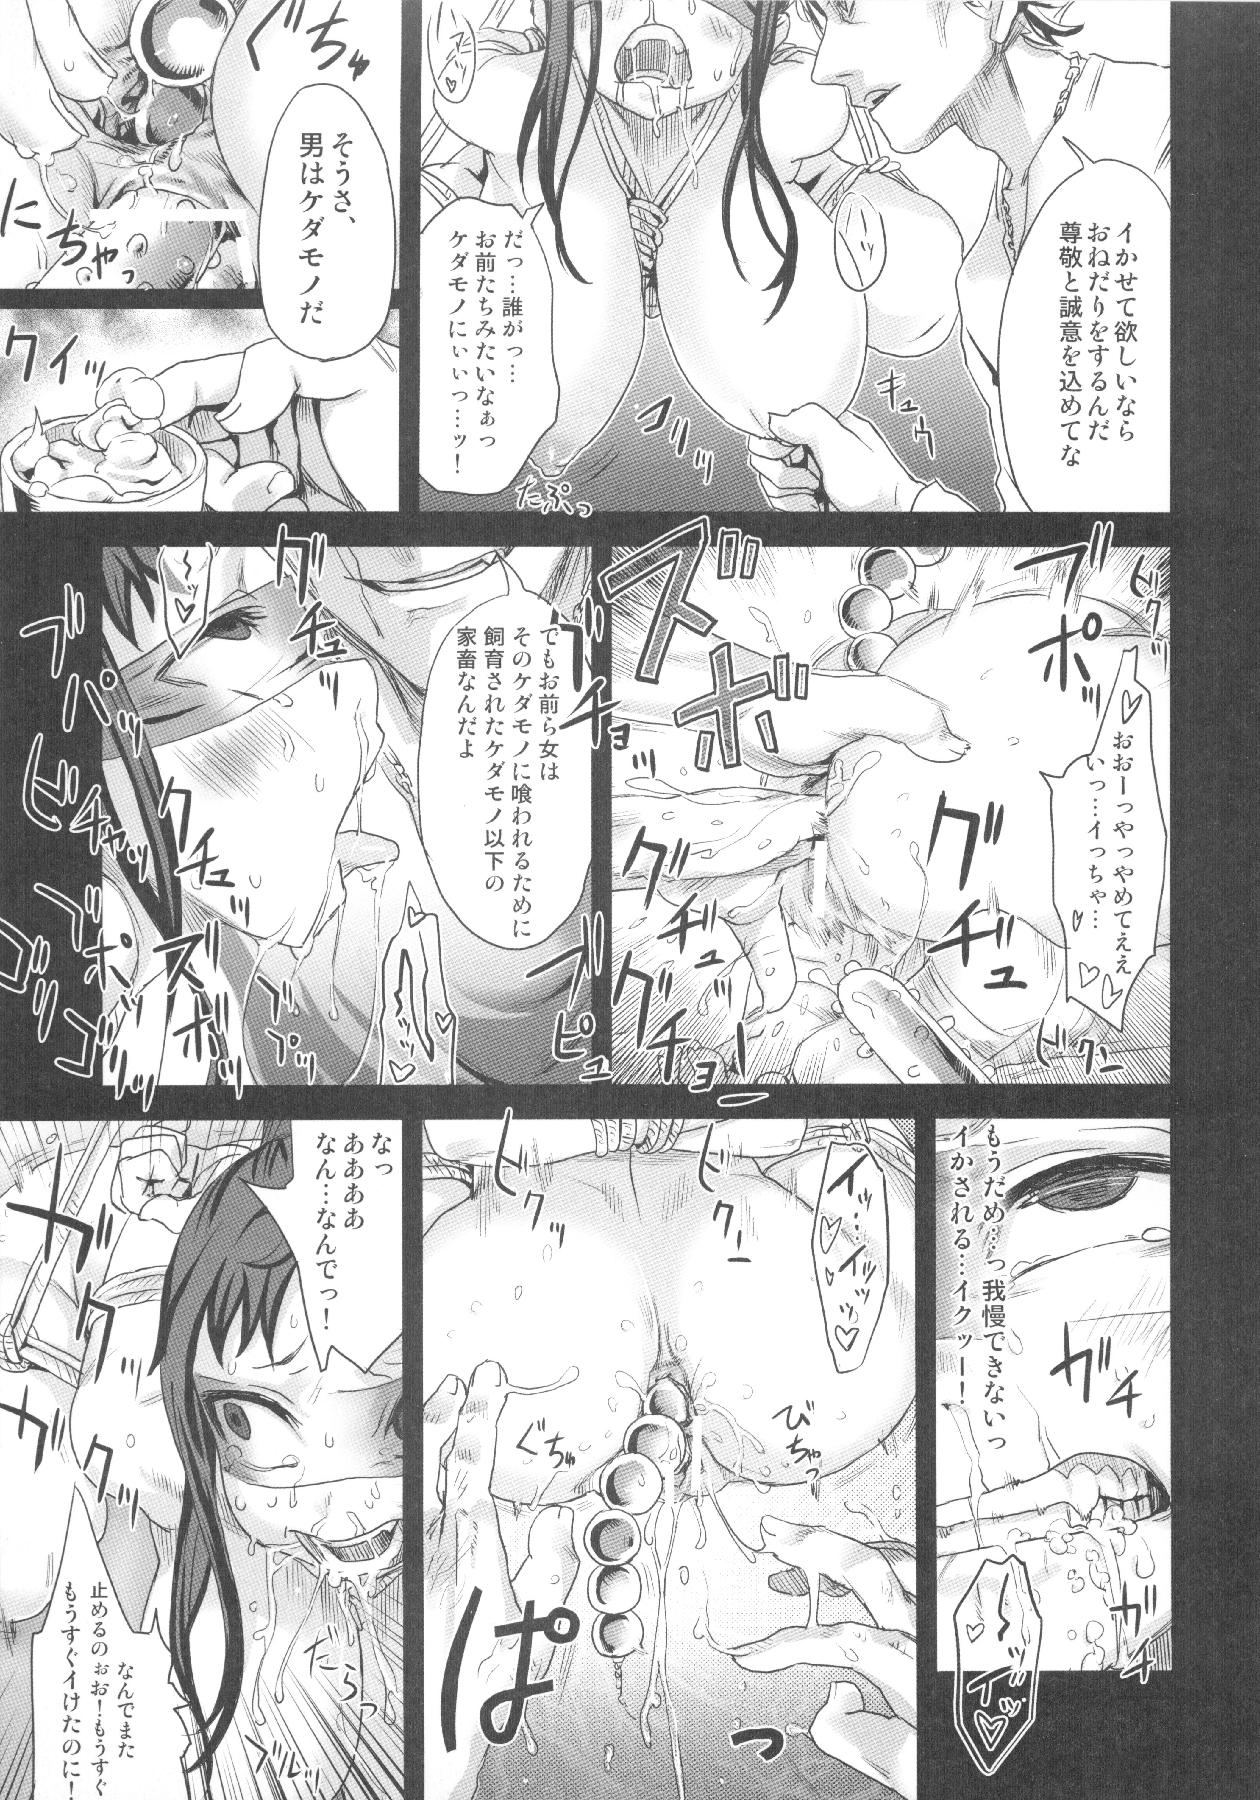 (C83) [Fatalpulse (Asanagi)] VictimGirls Compiled Vol.1 -Victimgirls Soushuuhen 1- MMO Game Selection (Various) 137